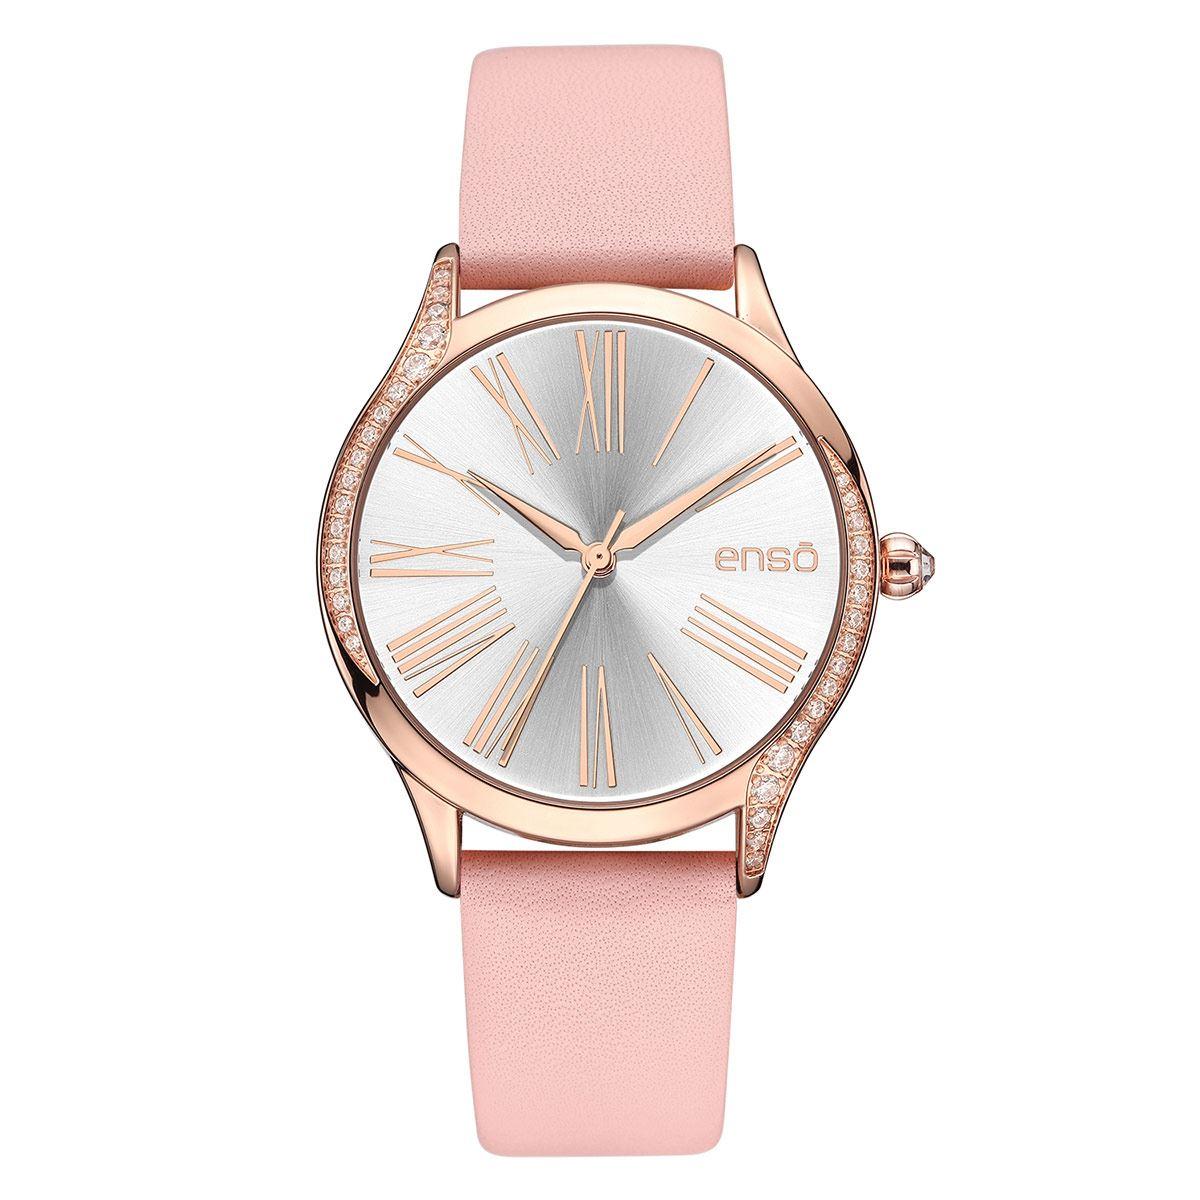 Reloj Enso EW1013L para Dama Correa de Piel